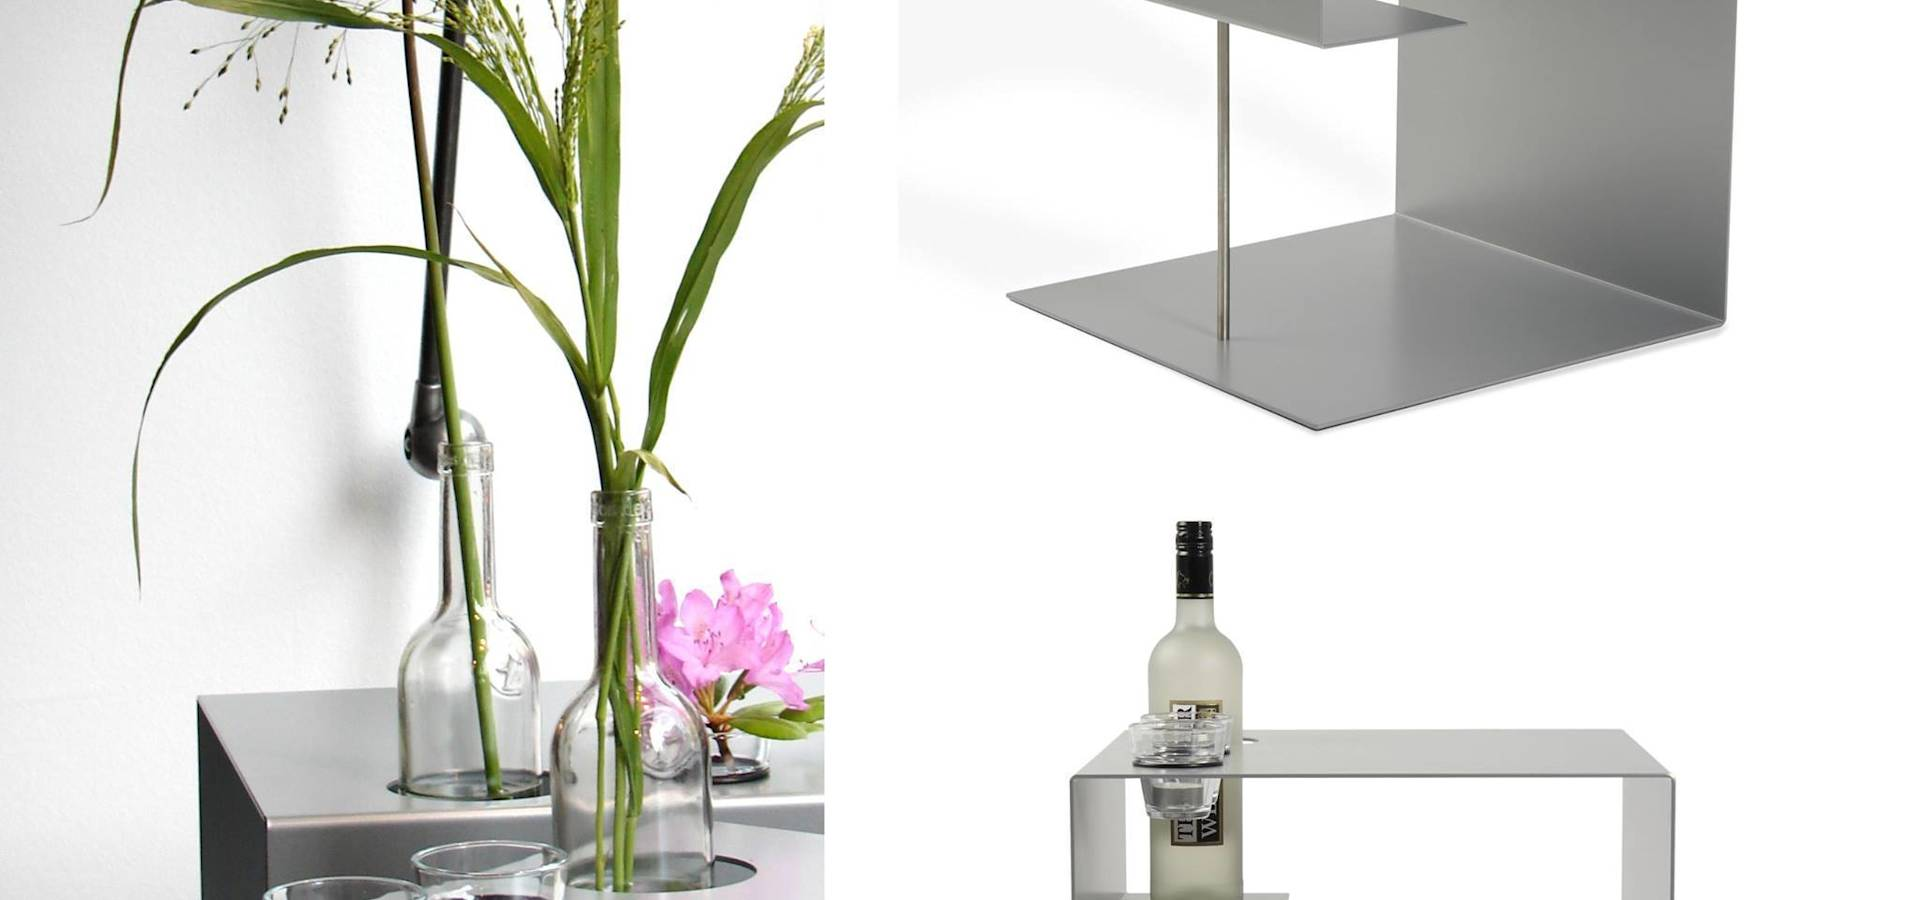 raum bild welt georg ziegler m bel accessoires in ellwangen homify. Black Bedroom Furniture Sets. Home Design Ideas